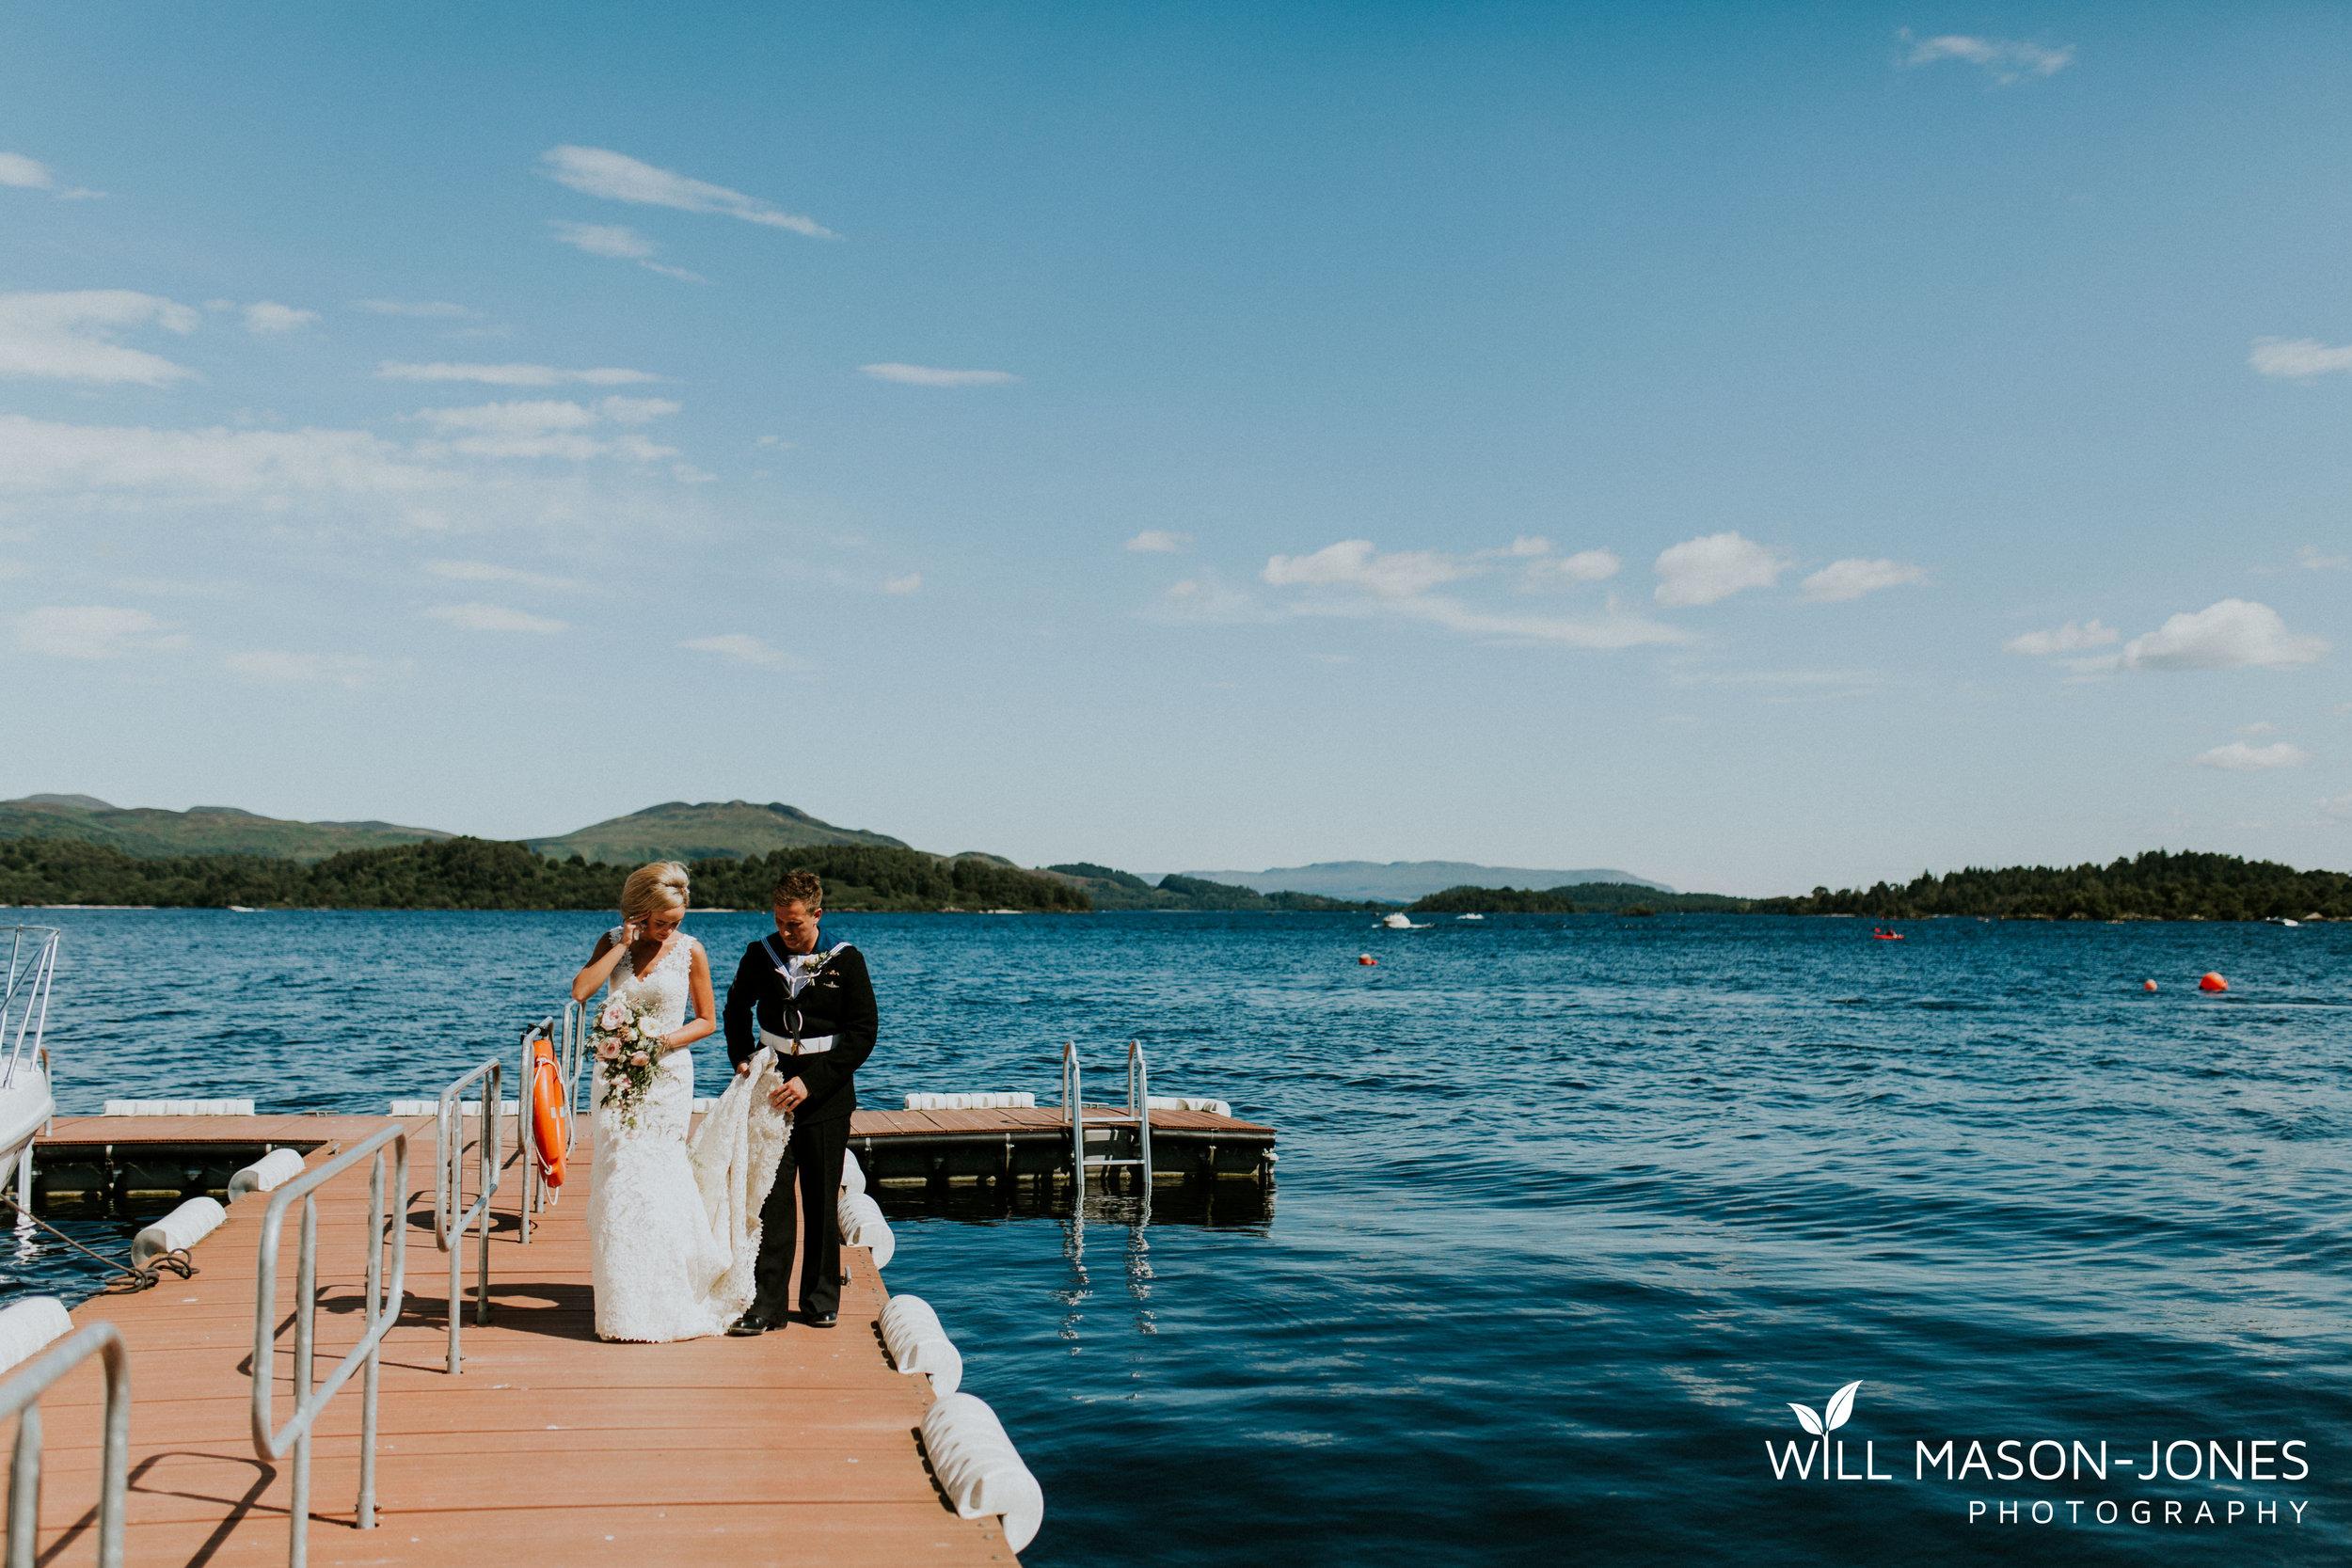 loch-lomond-destination-wedding-photographer-scotland-uk-wales-56.jpg